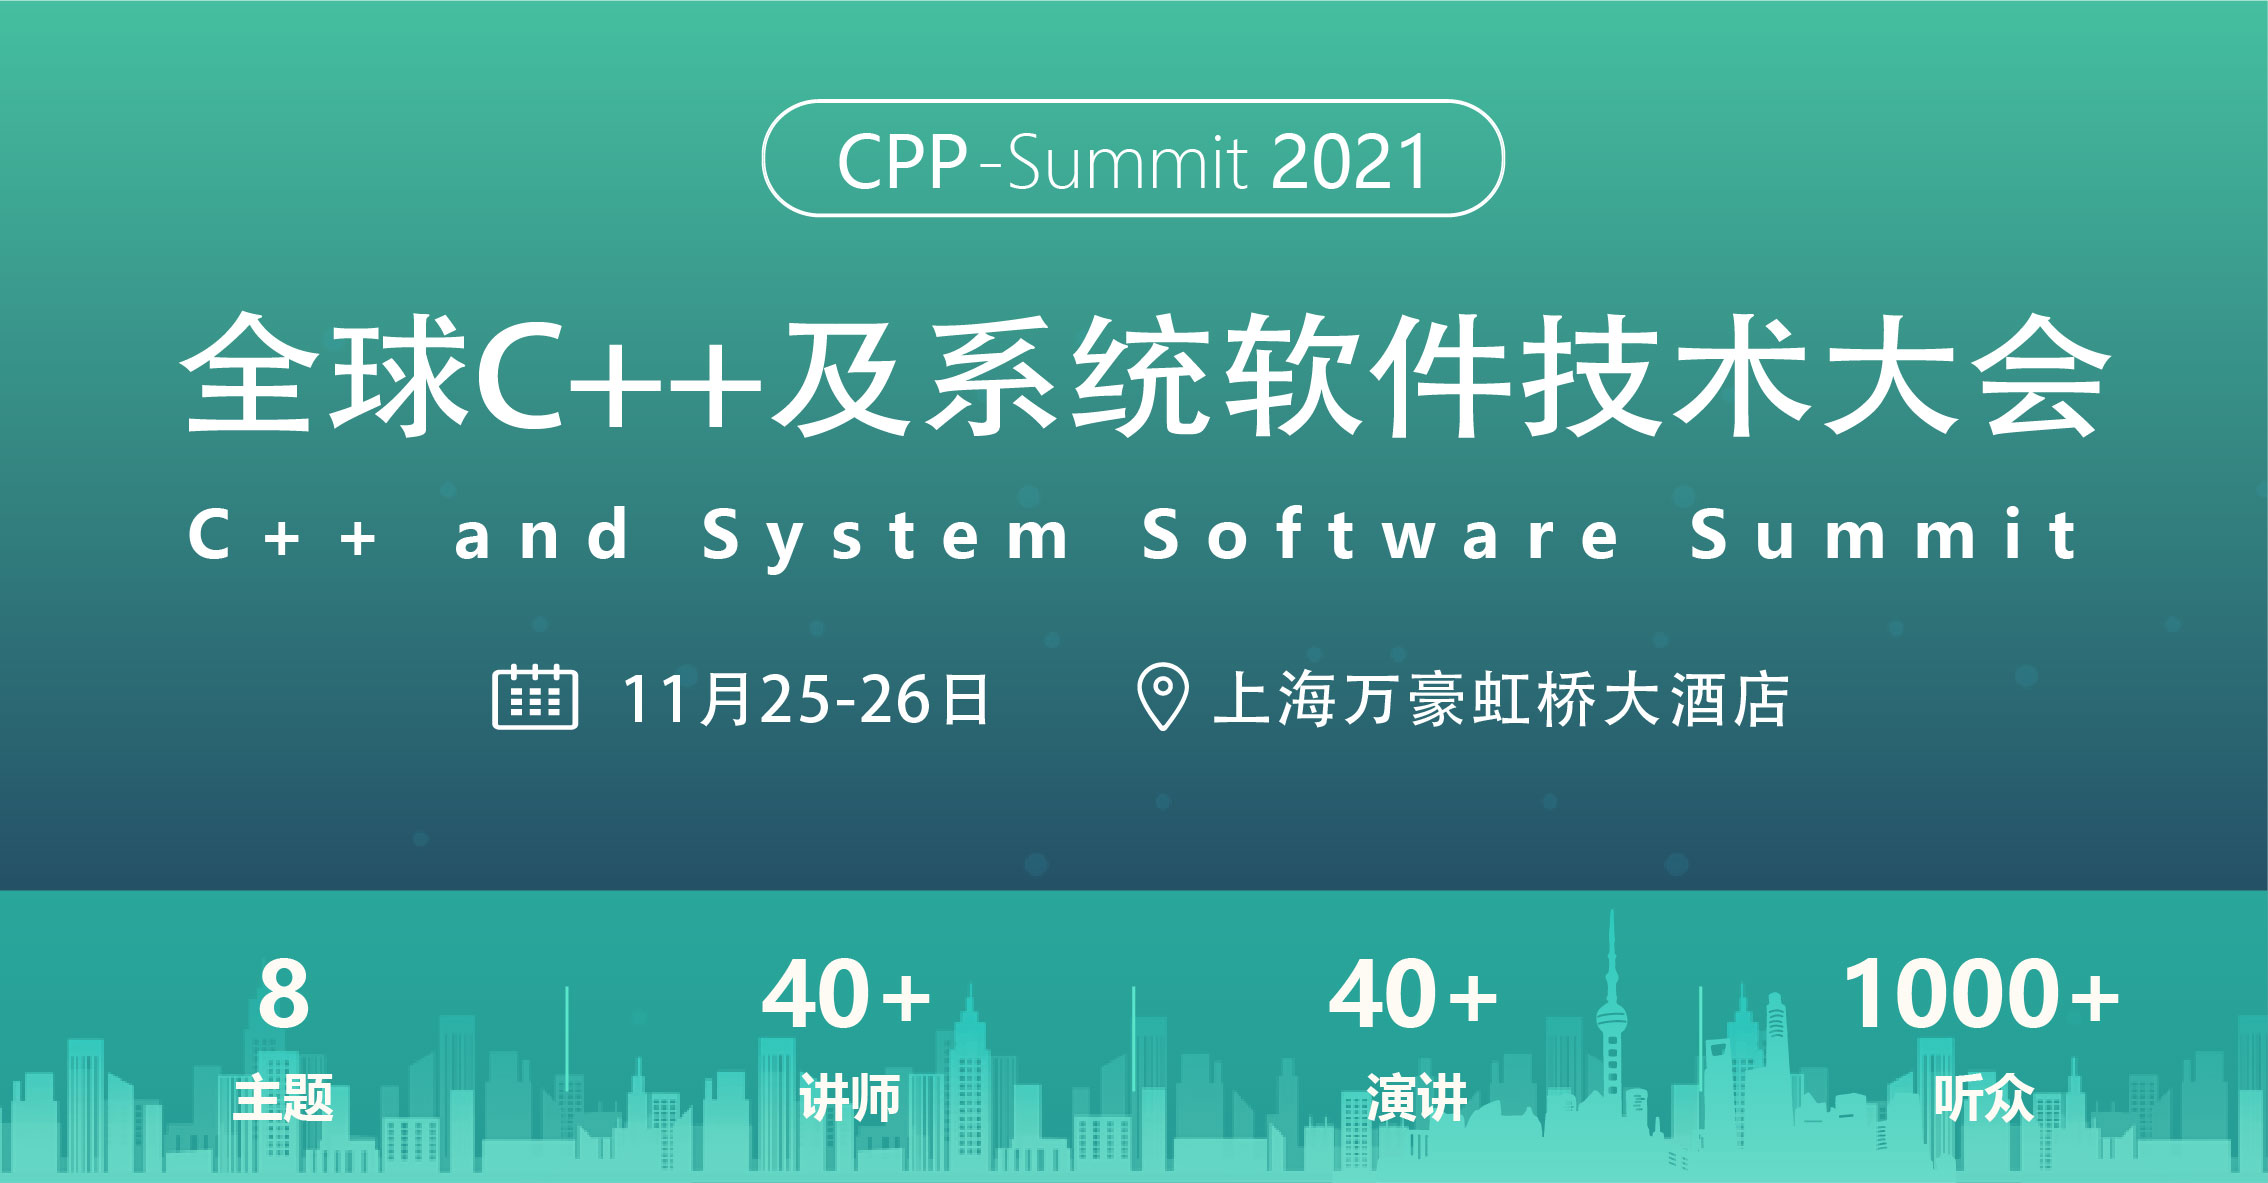 C++之父Bjarne Stroustrup领衔2021全球C++及系统软件技术大会